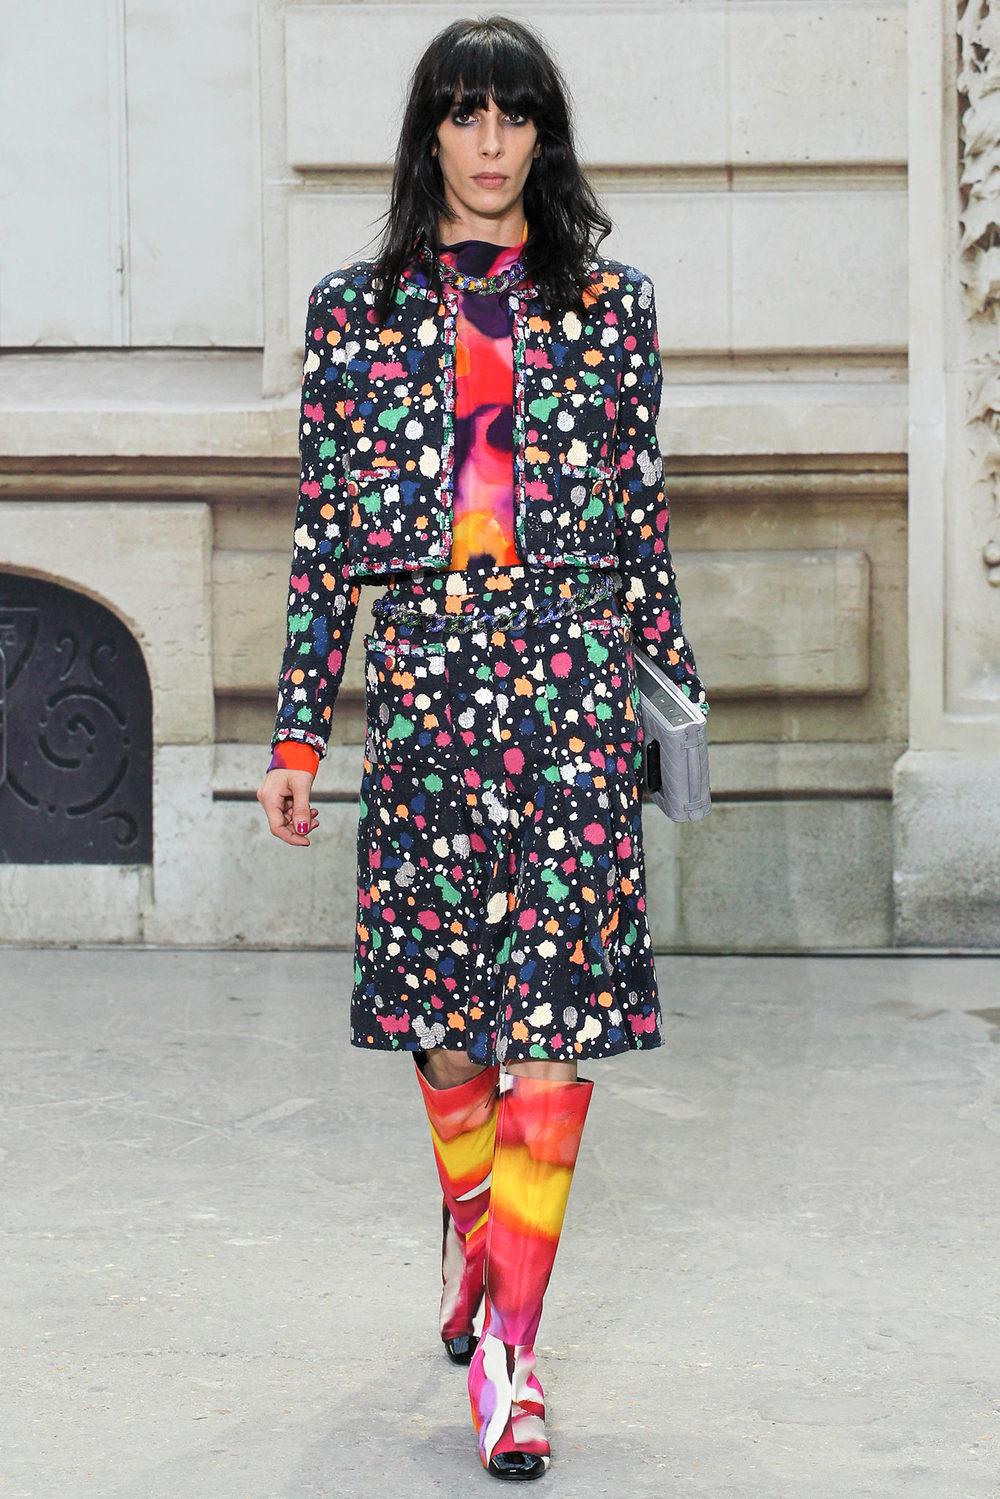 Chanel Spring Summer 2015 Coloured Splatter Print